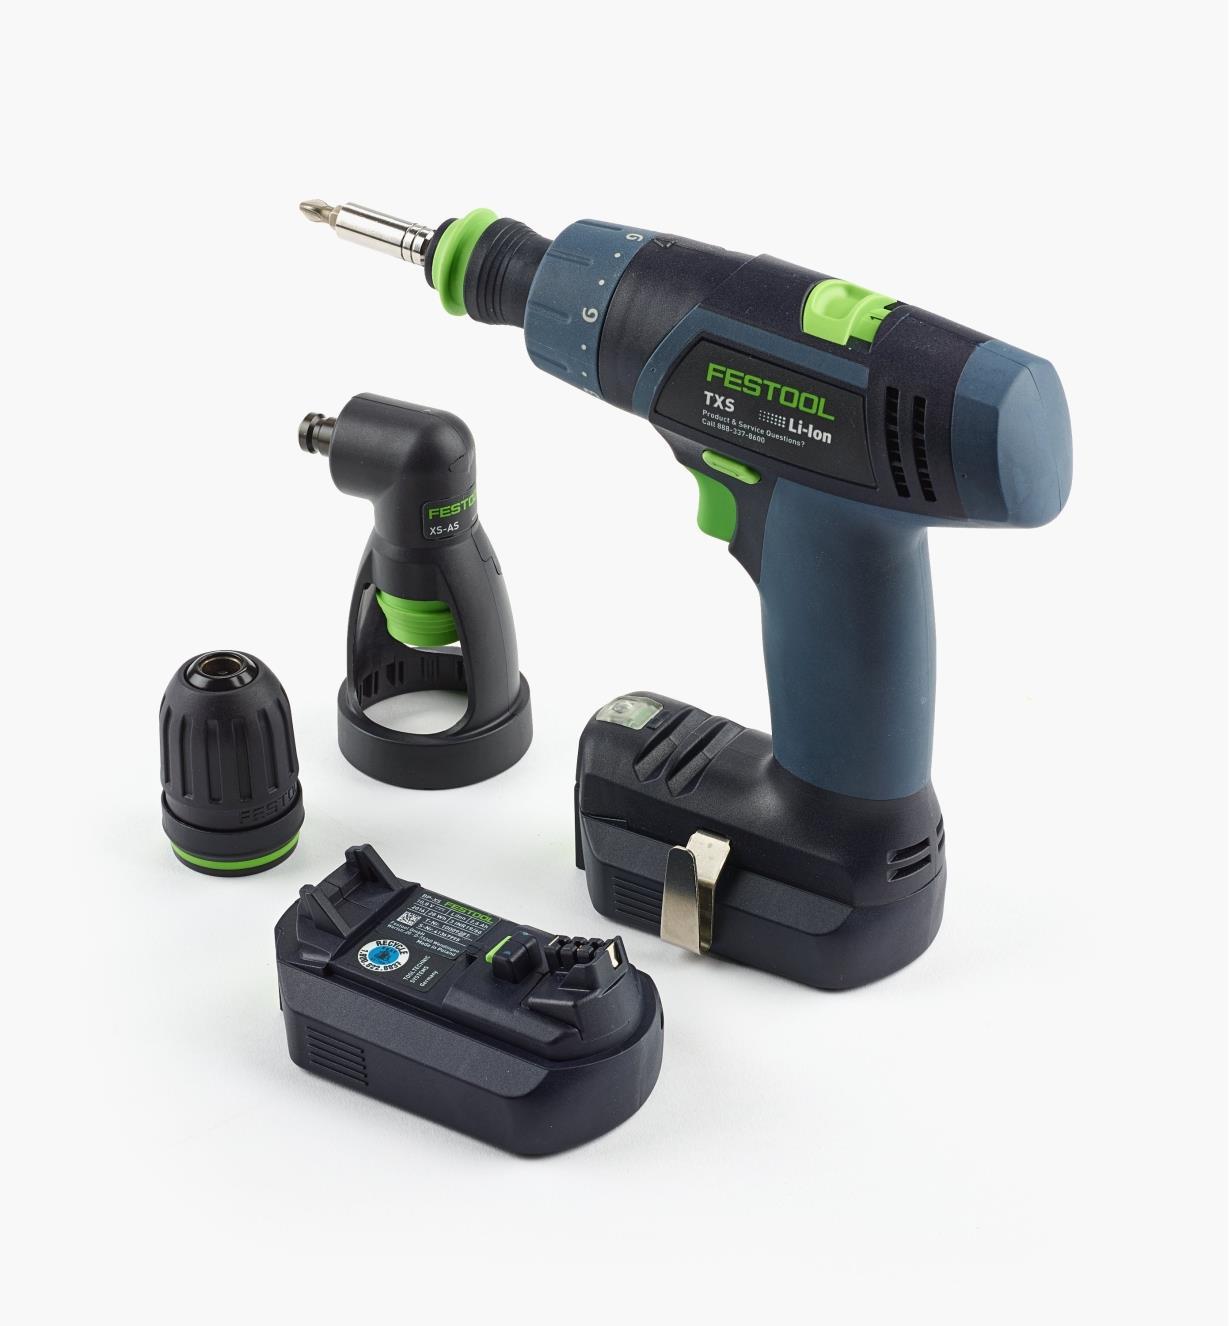 ZT564514 - TXS Cordless Drill Set